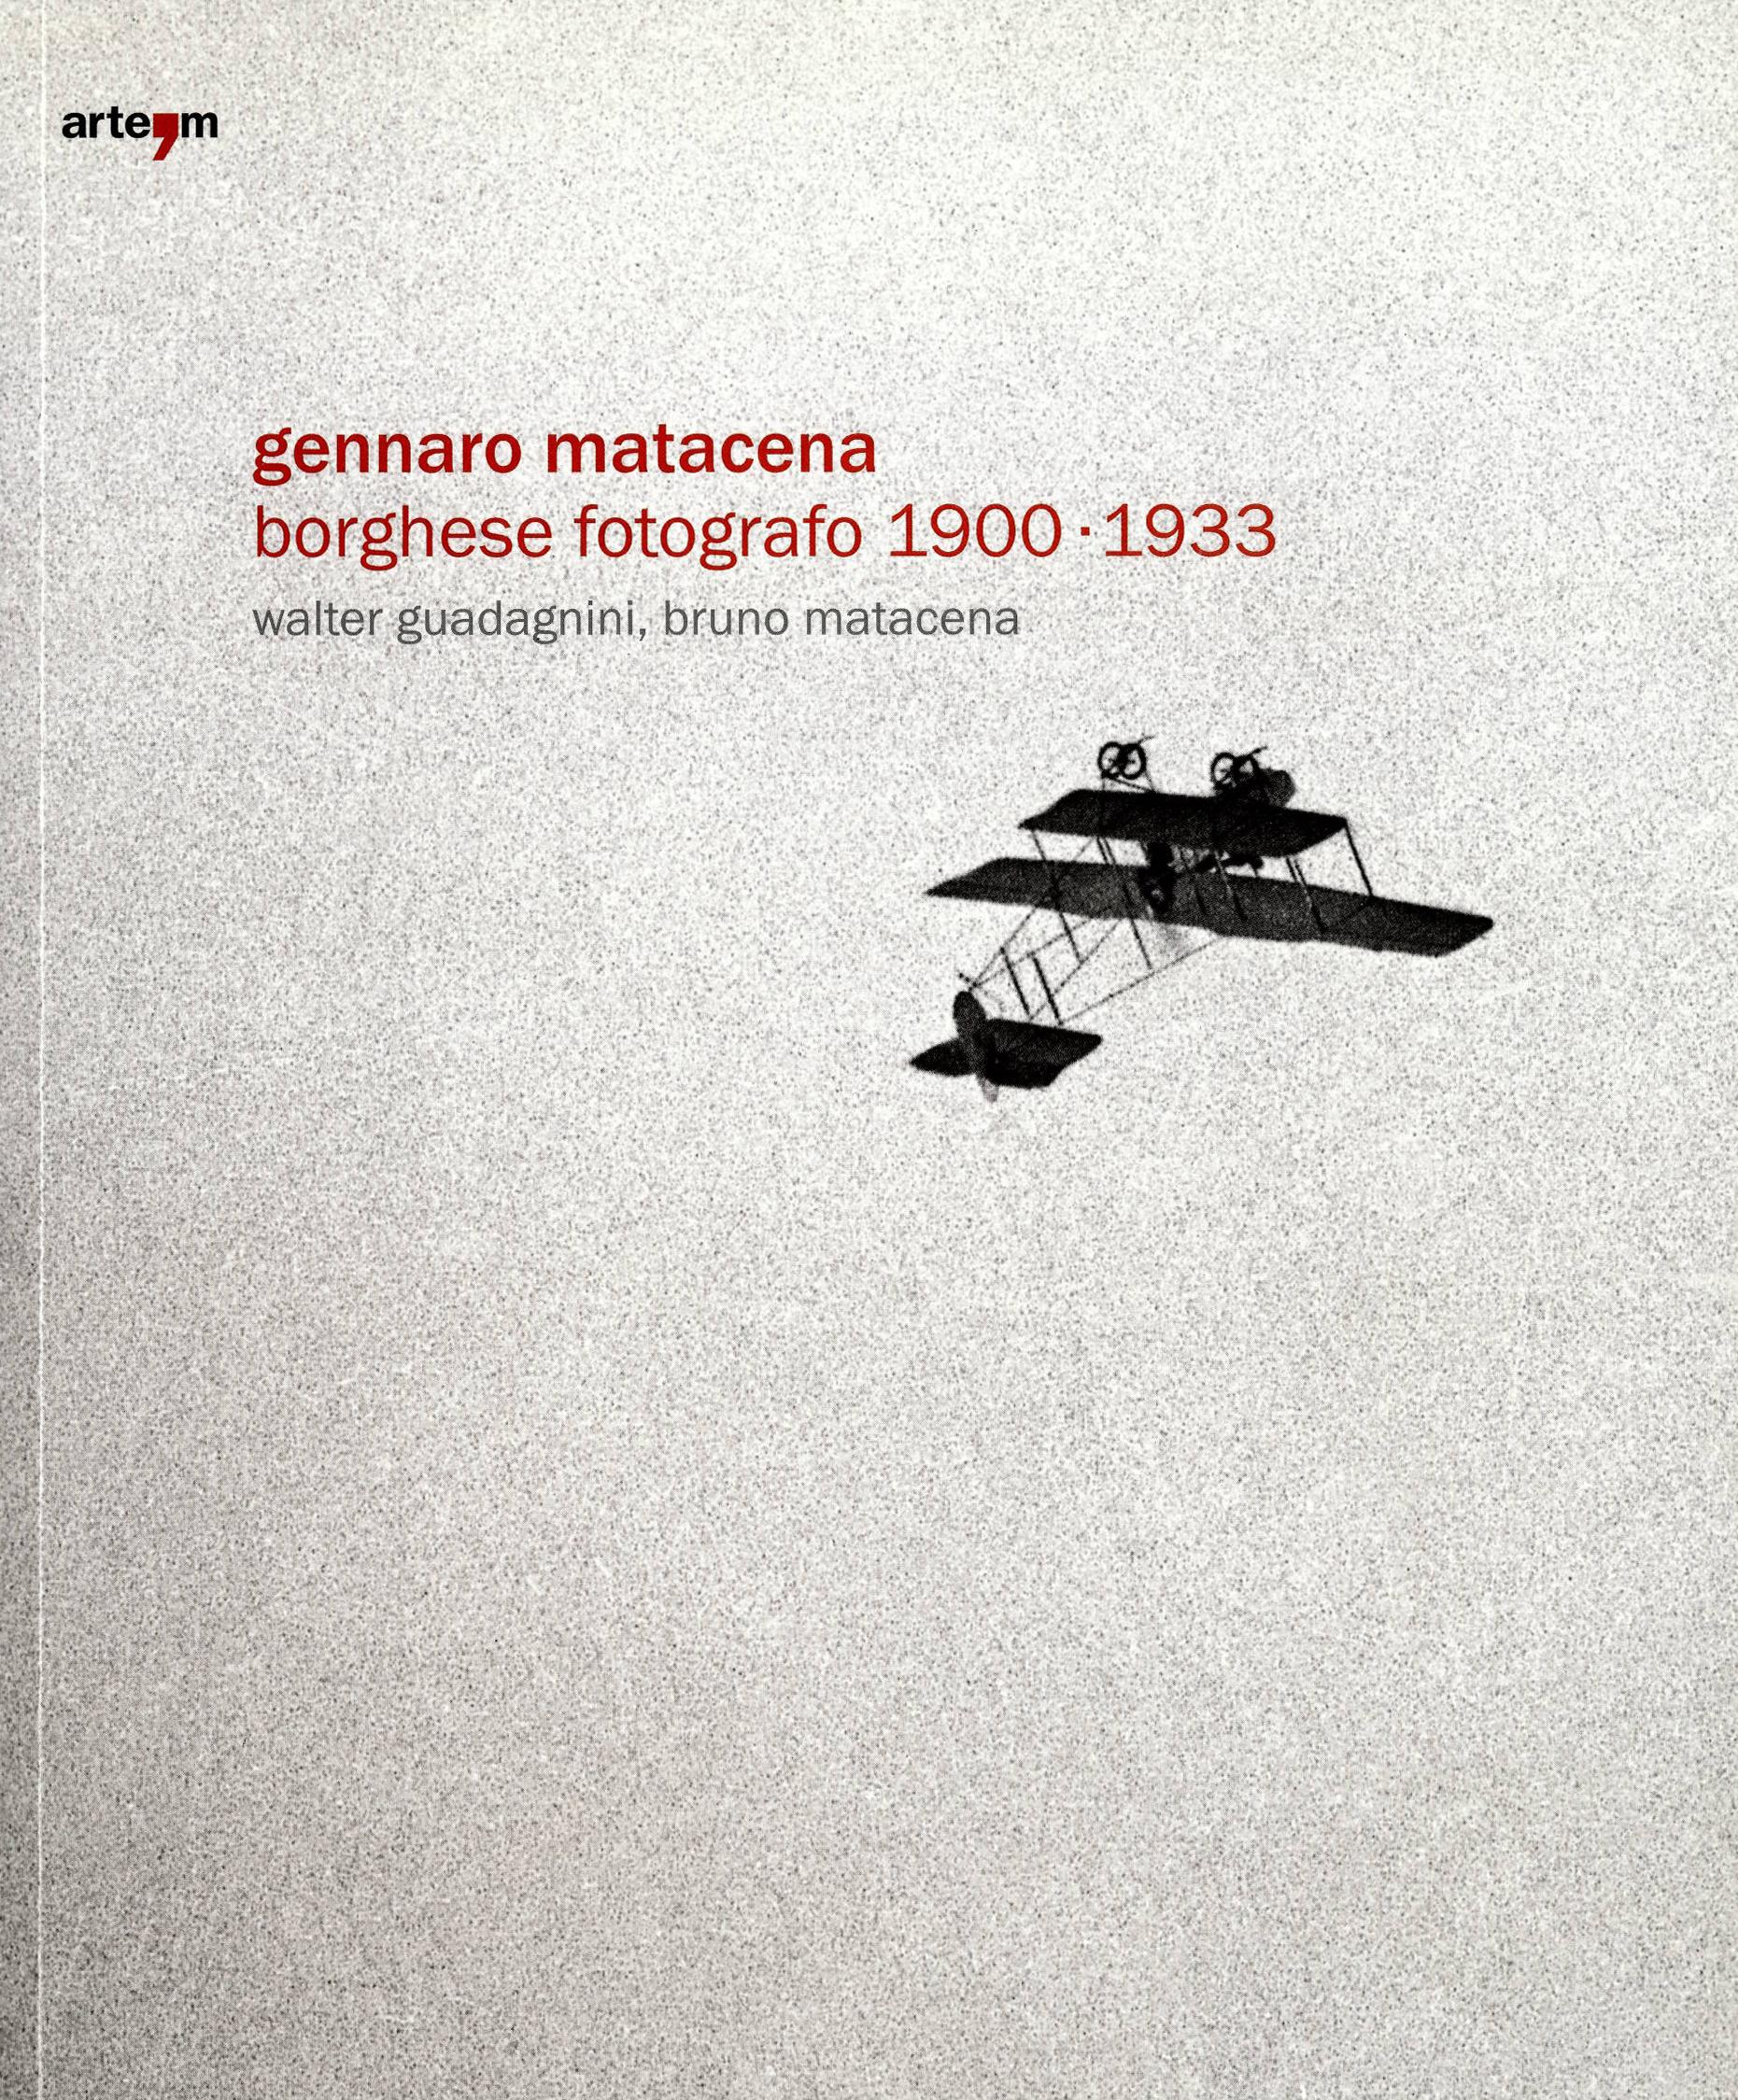 Gennaro Matacena, borghese fotografo 1900-1933